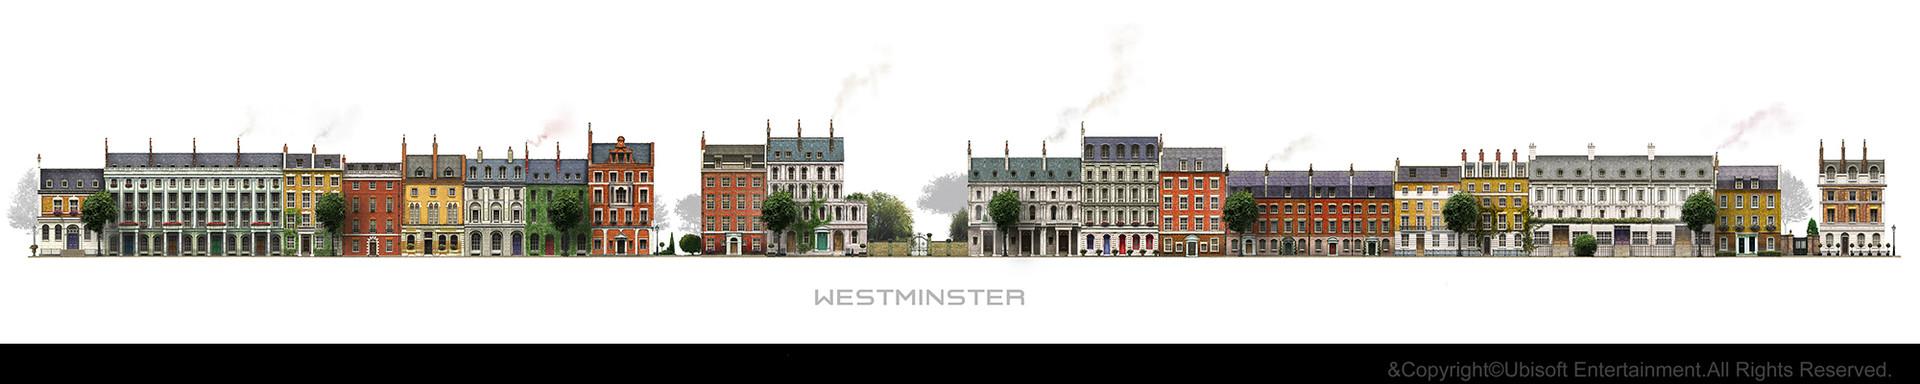 Gilles beloeil acvi ev facades maisons westminster gbeloeil